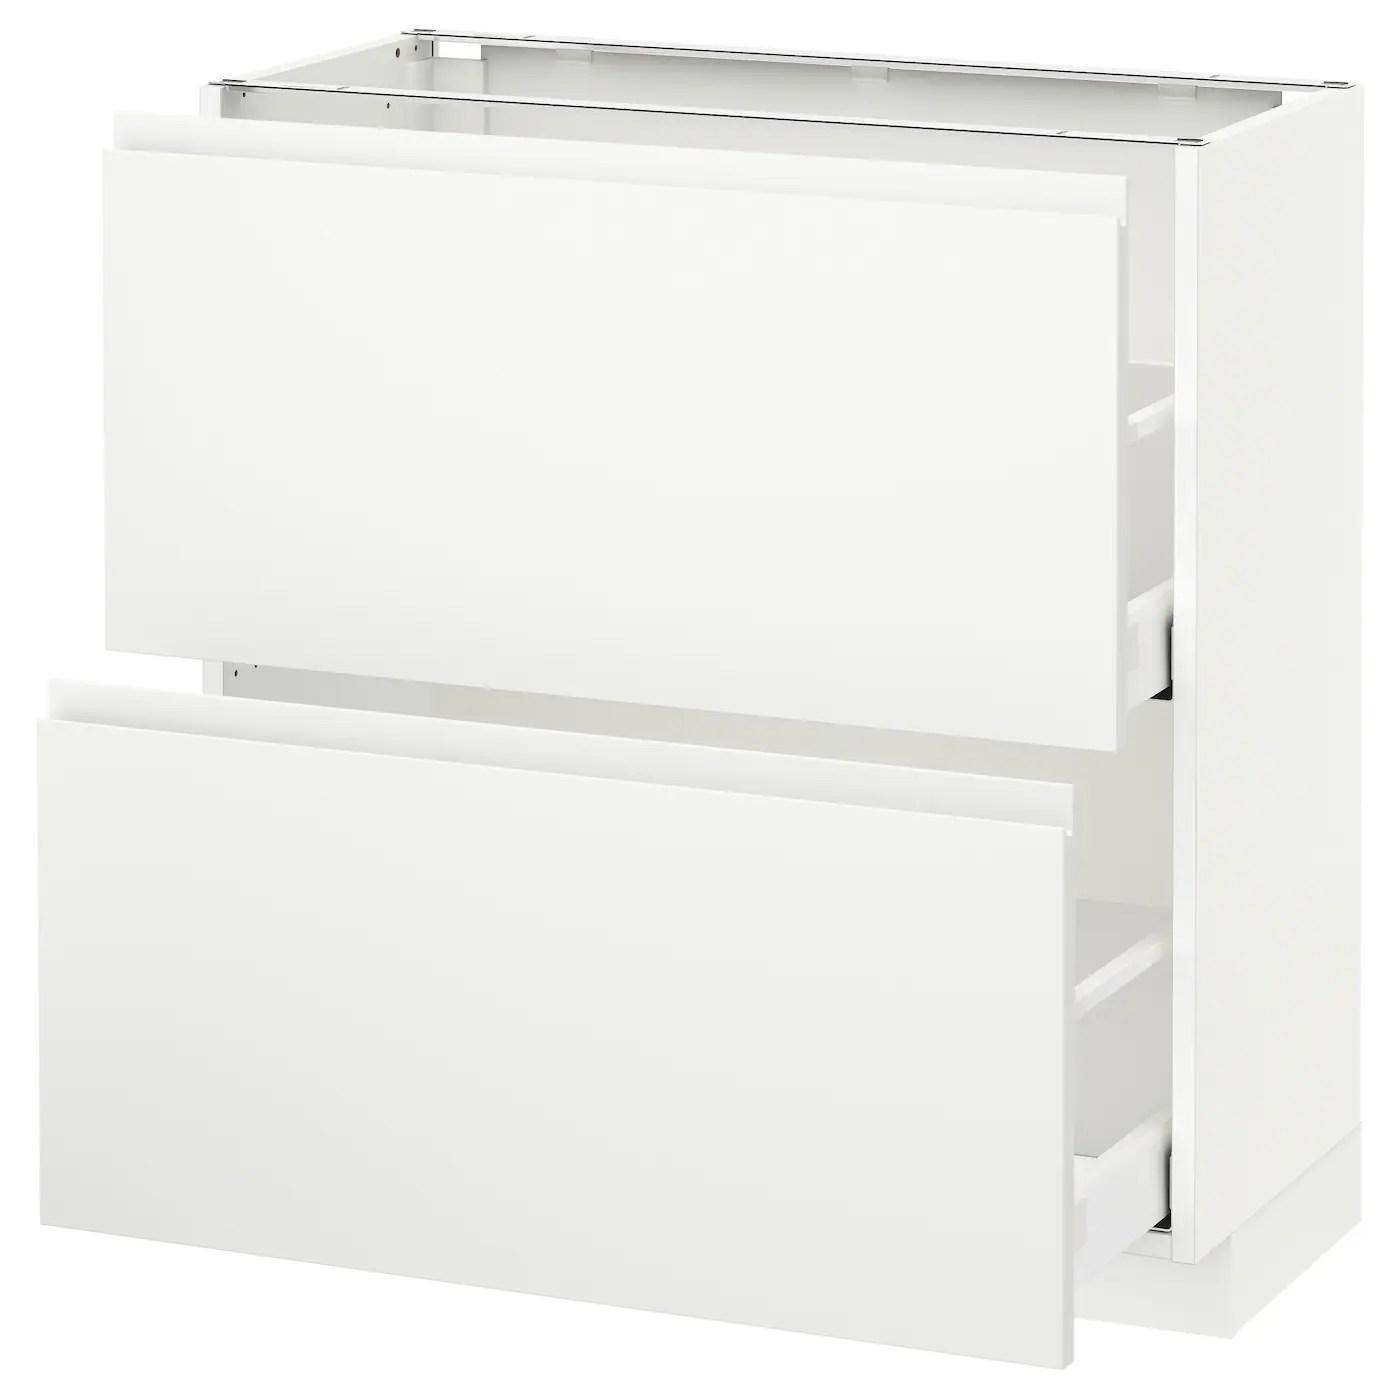 metod maximera element bas 2 tiroirs blanc voxtorp blanc mat 80x37 cm